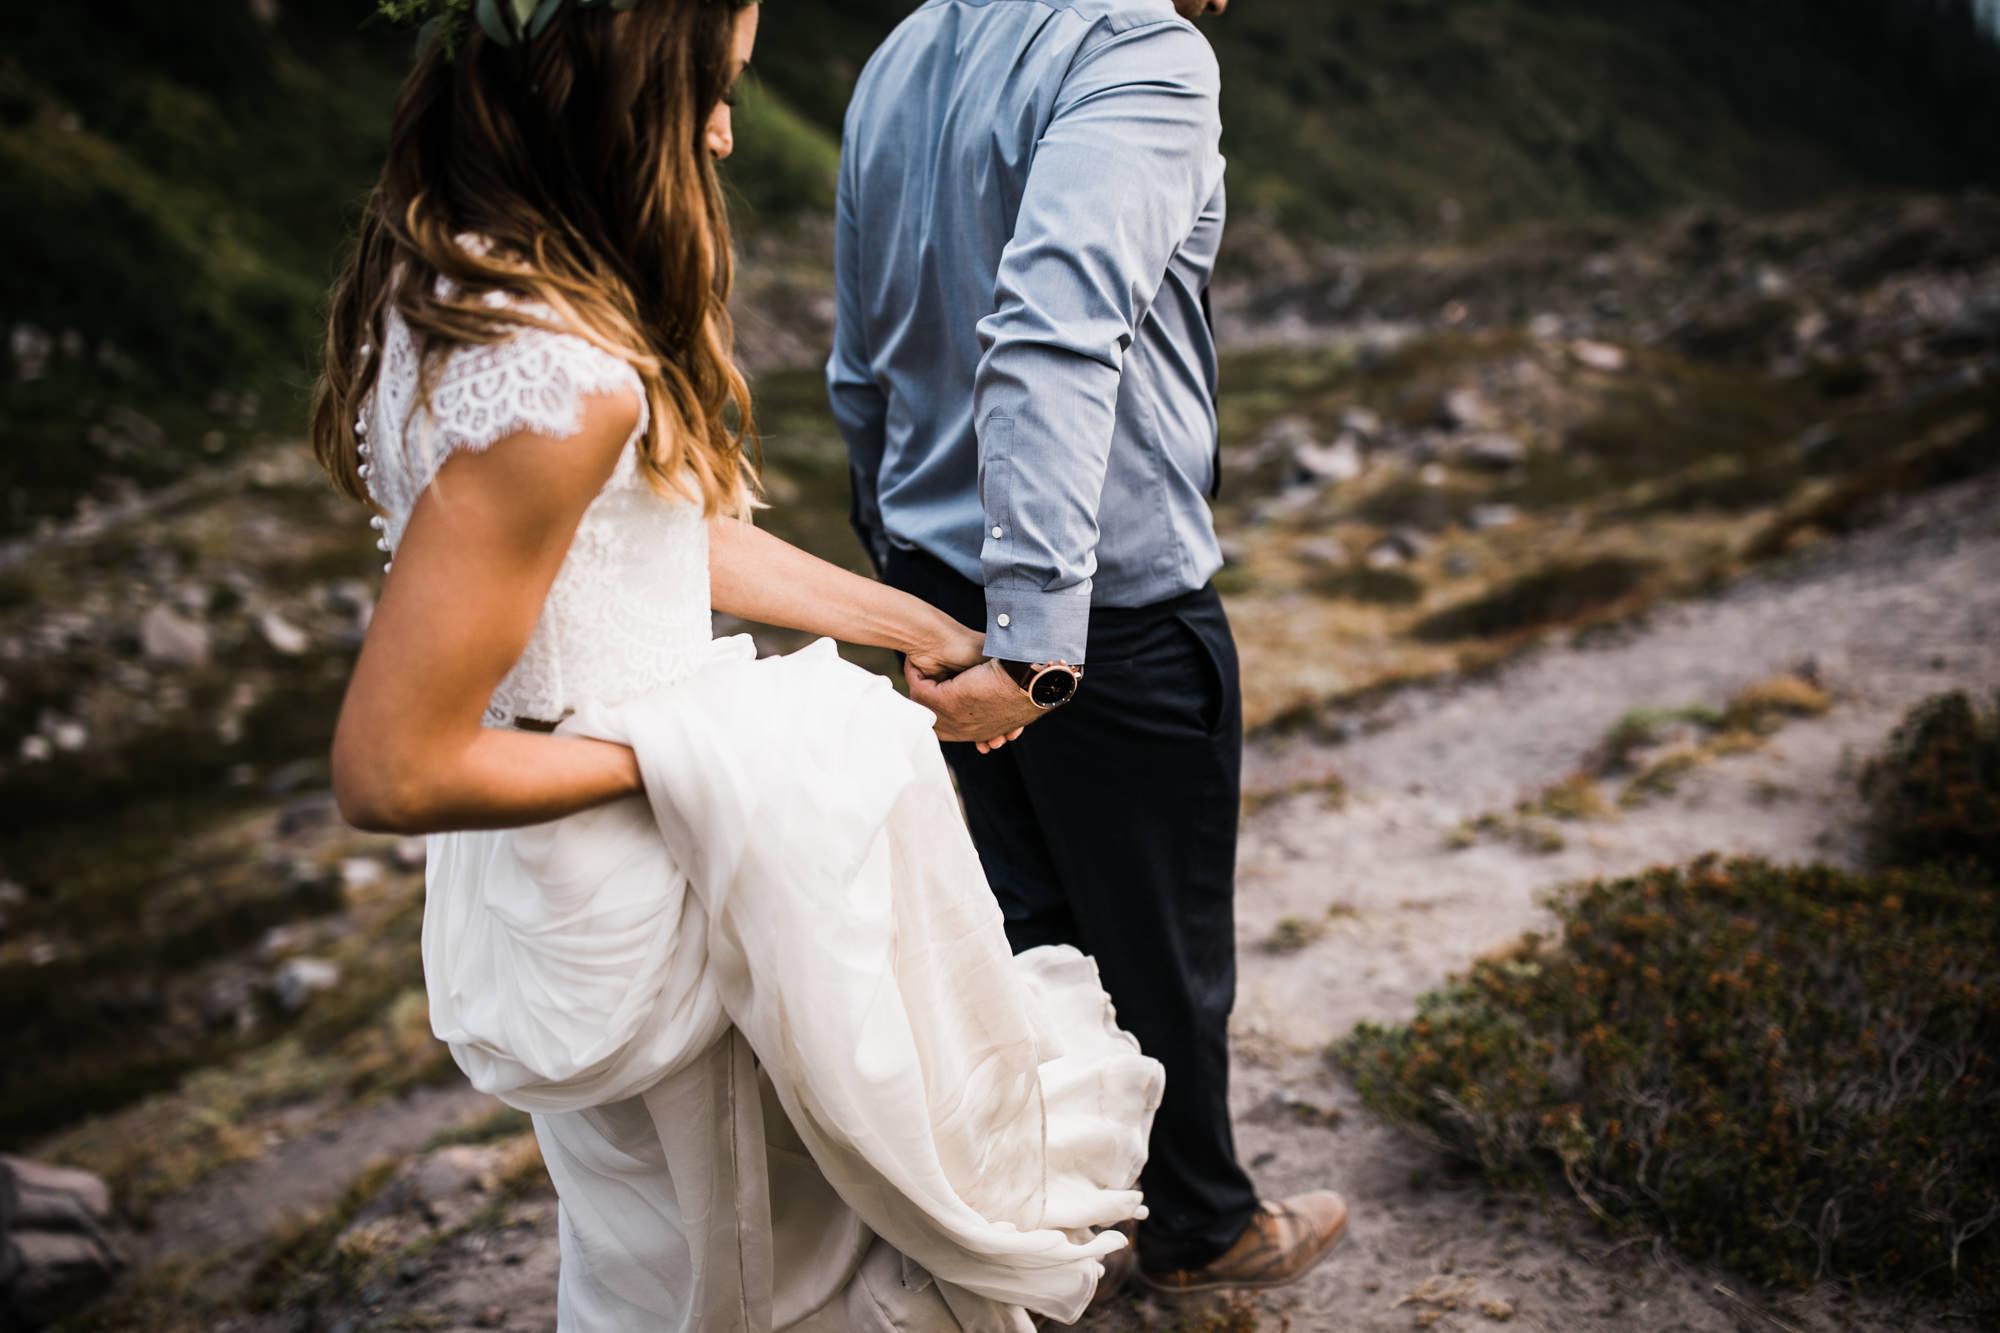 adventurous hiking elopement in mount rainier national park | destination adventure wedding photographers | the hearnes adventure photography | www.thehearnes.com